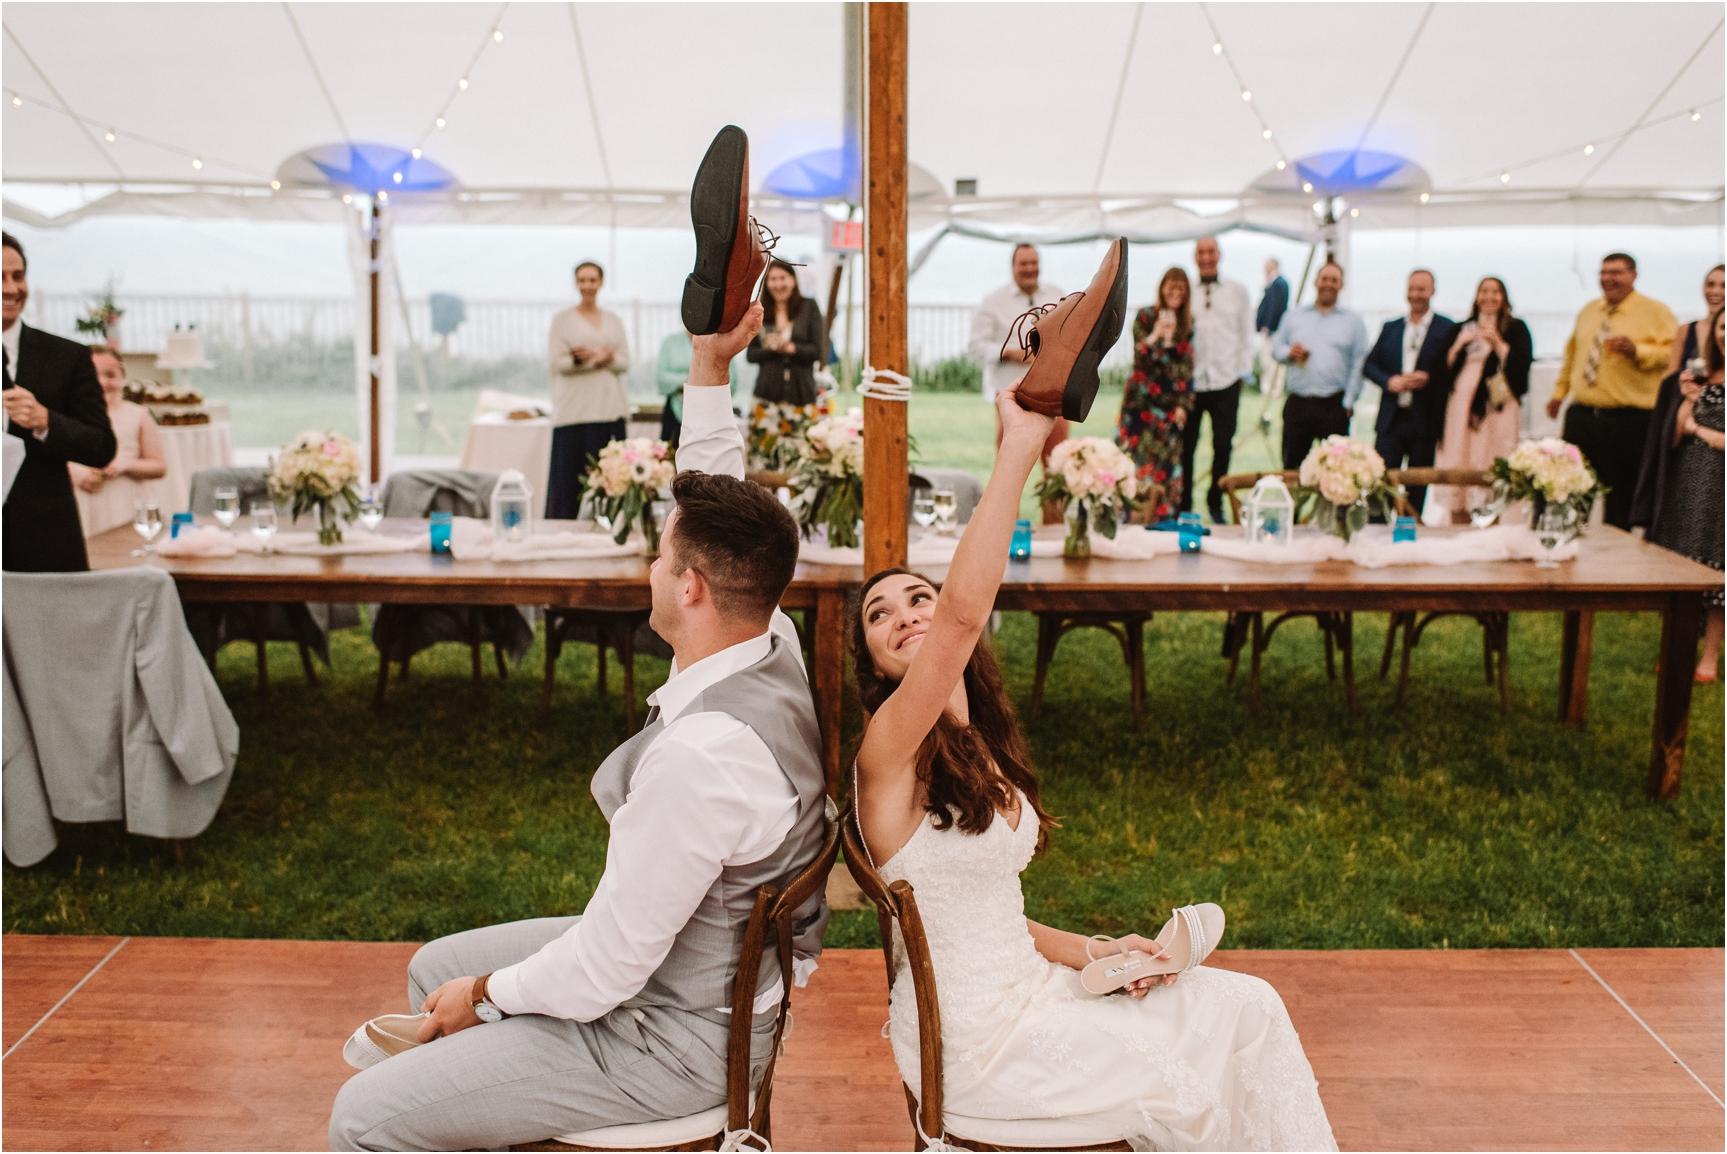 Sarah & Sam Pelham House Cape Cod Wedding Photographer-219.jpg